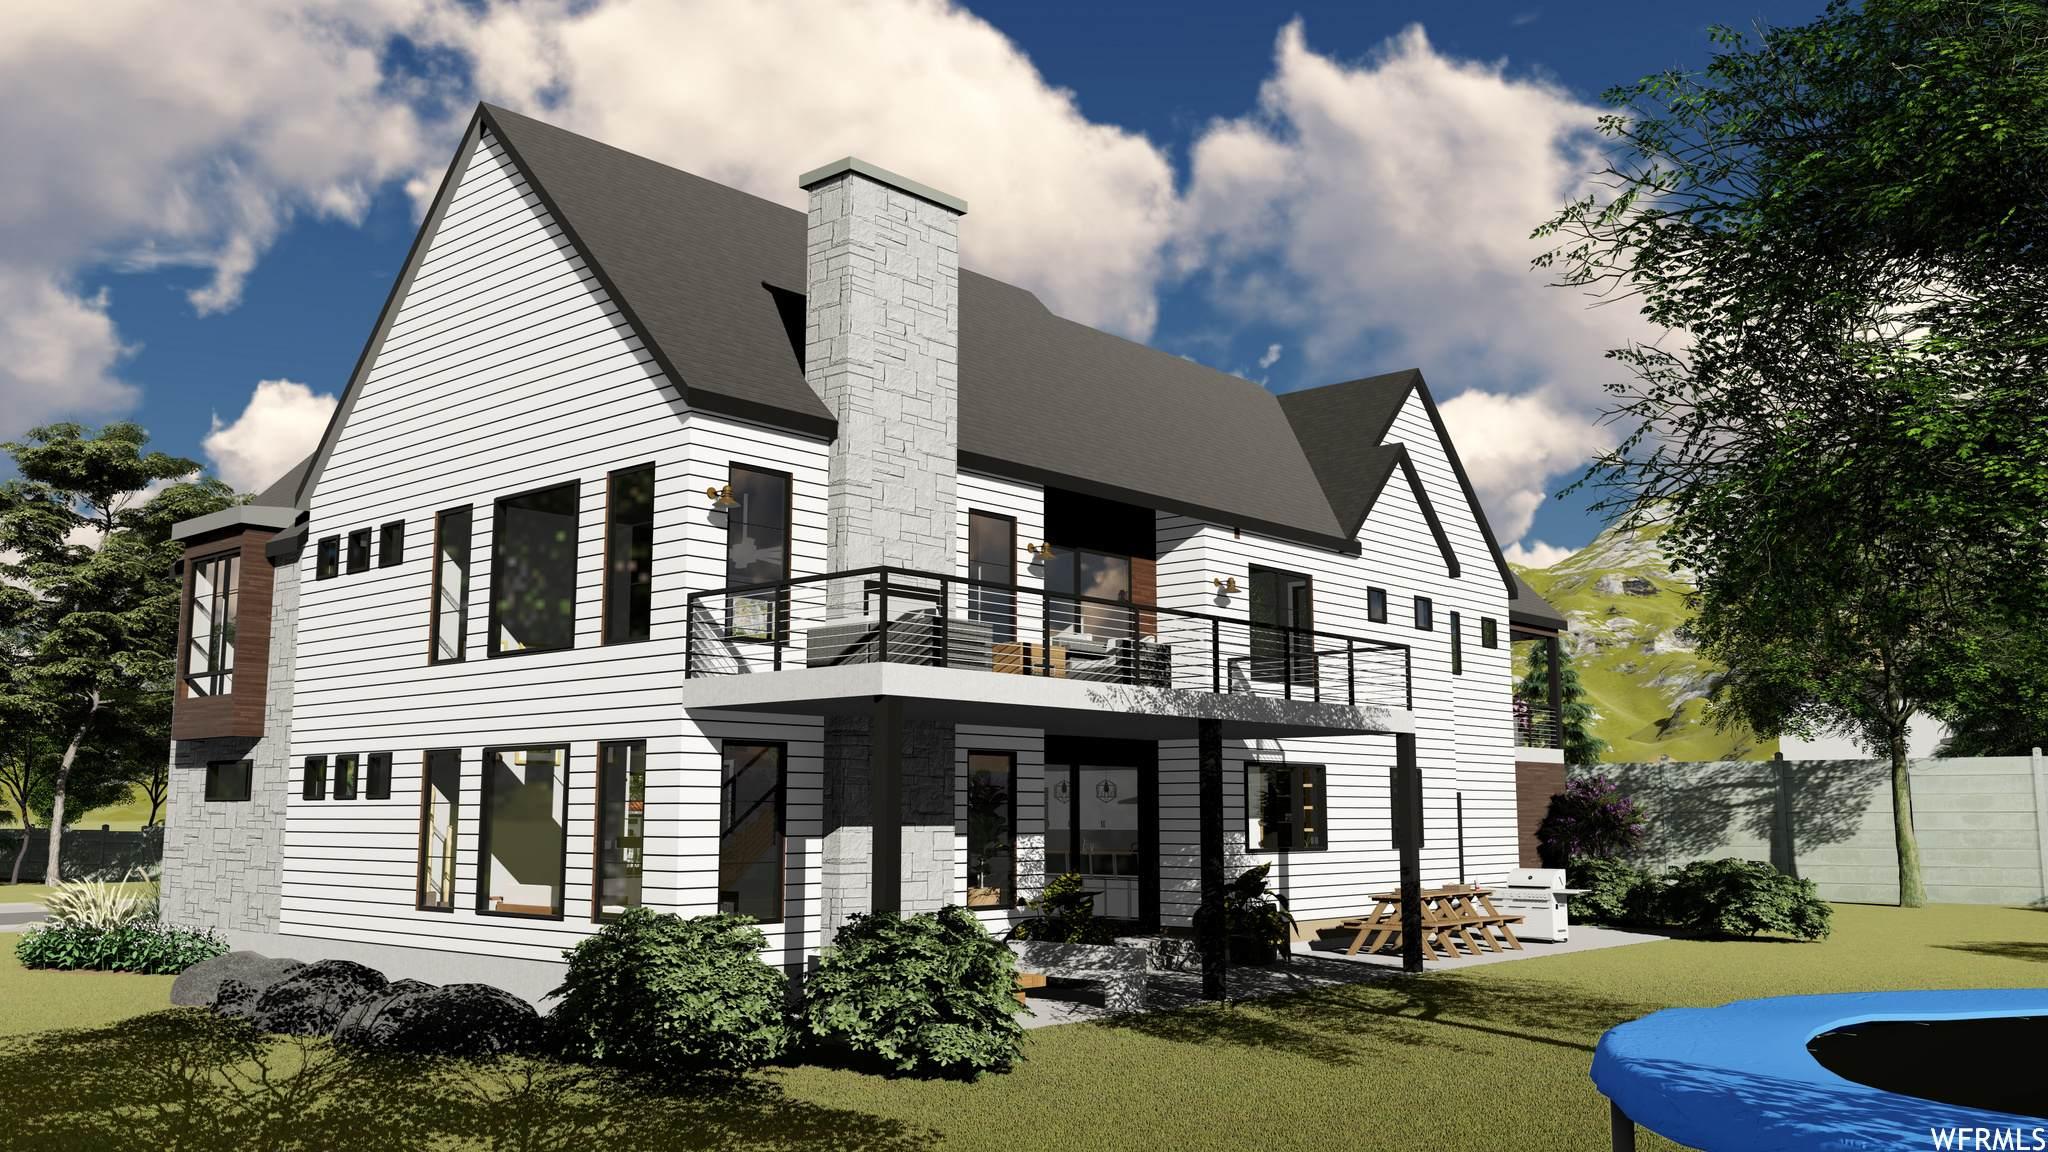 4906 N Vialetto Way, Lehi, UT 84043 (MLS #1693607) :: Jeremy Back Real Estate Team